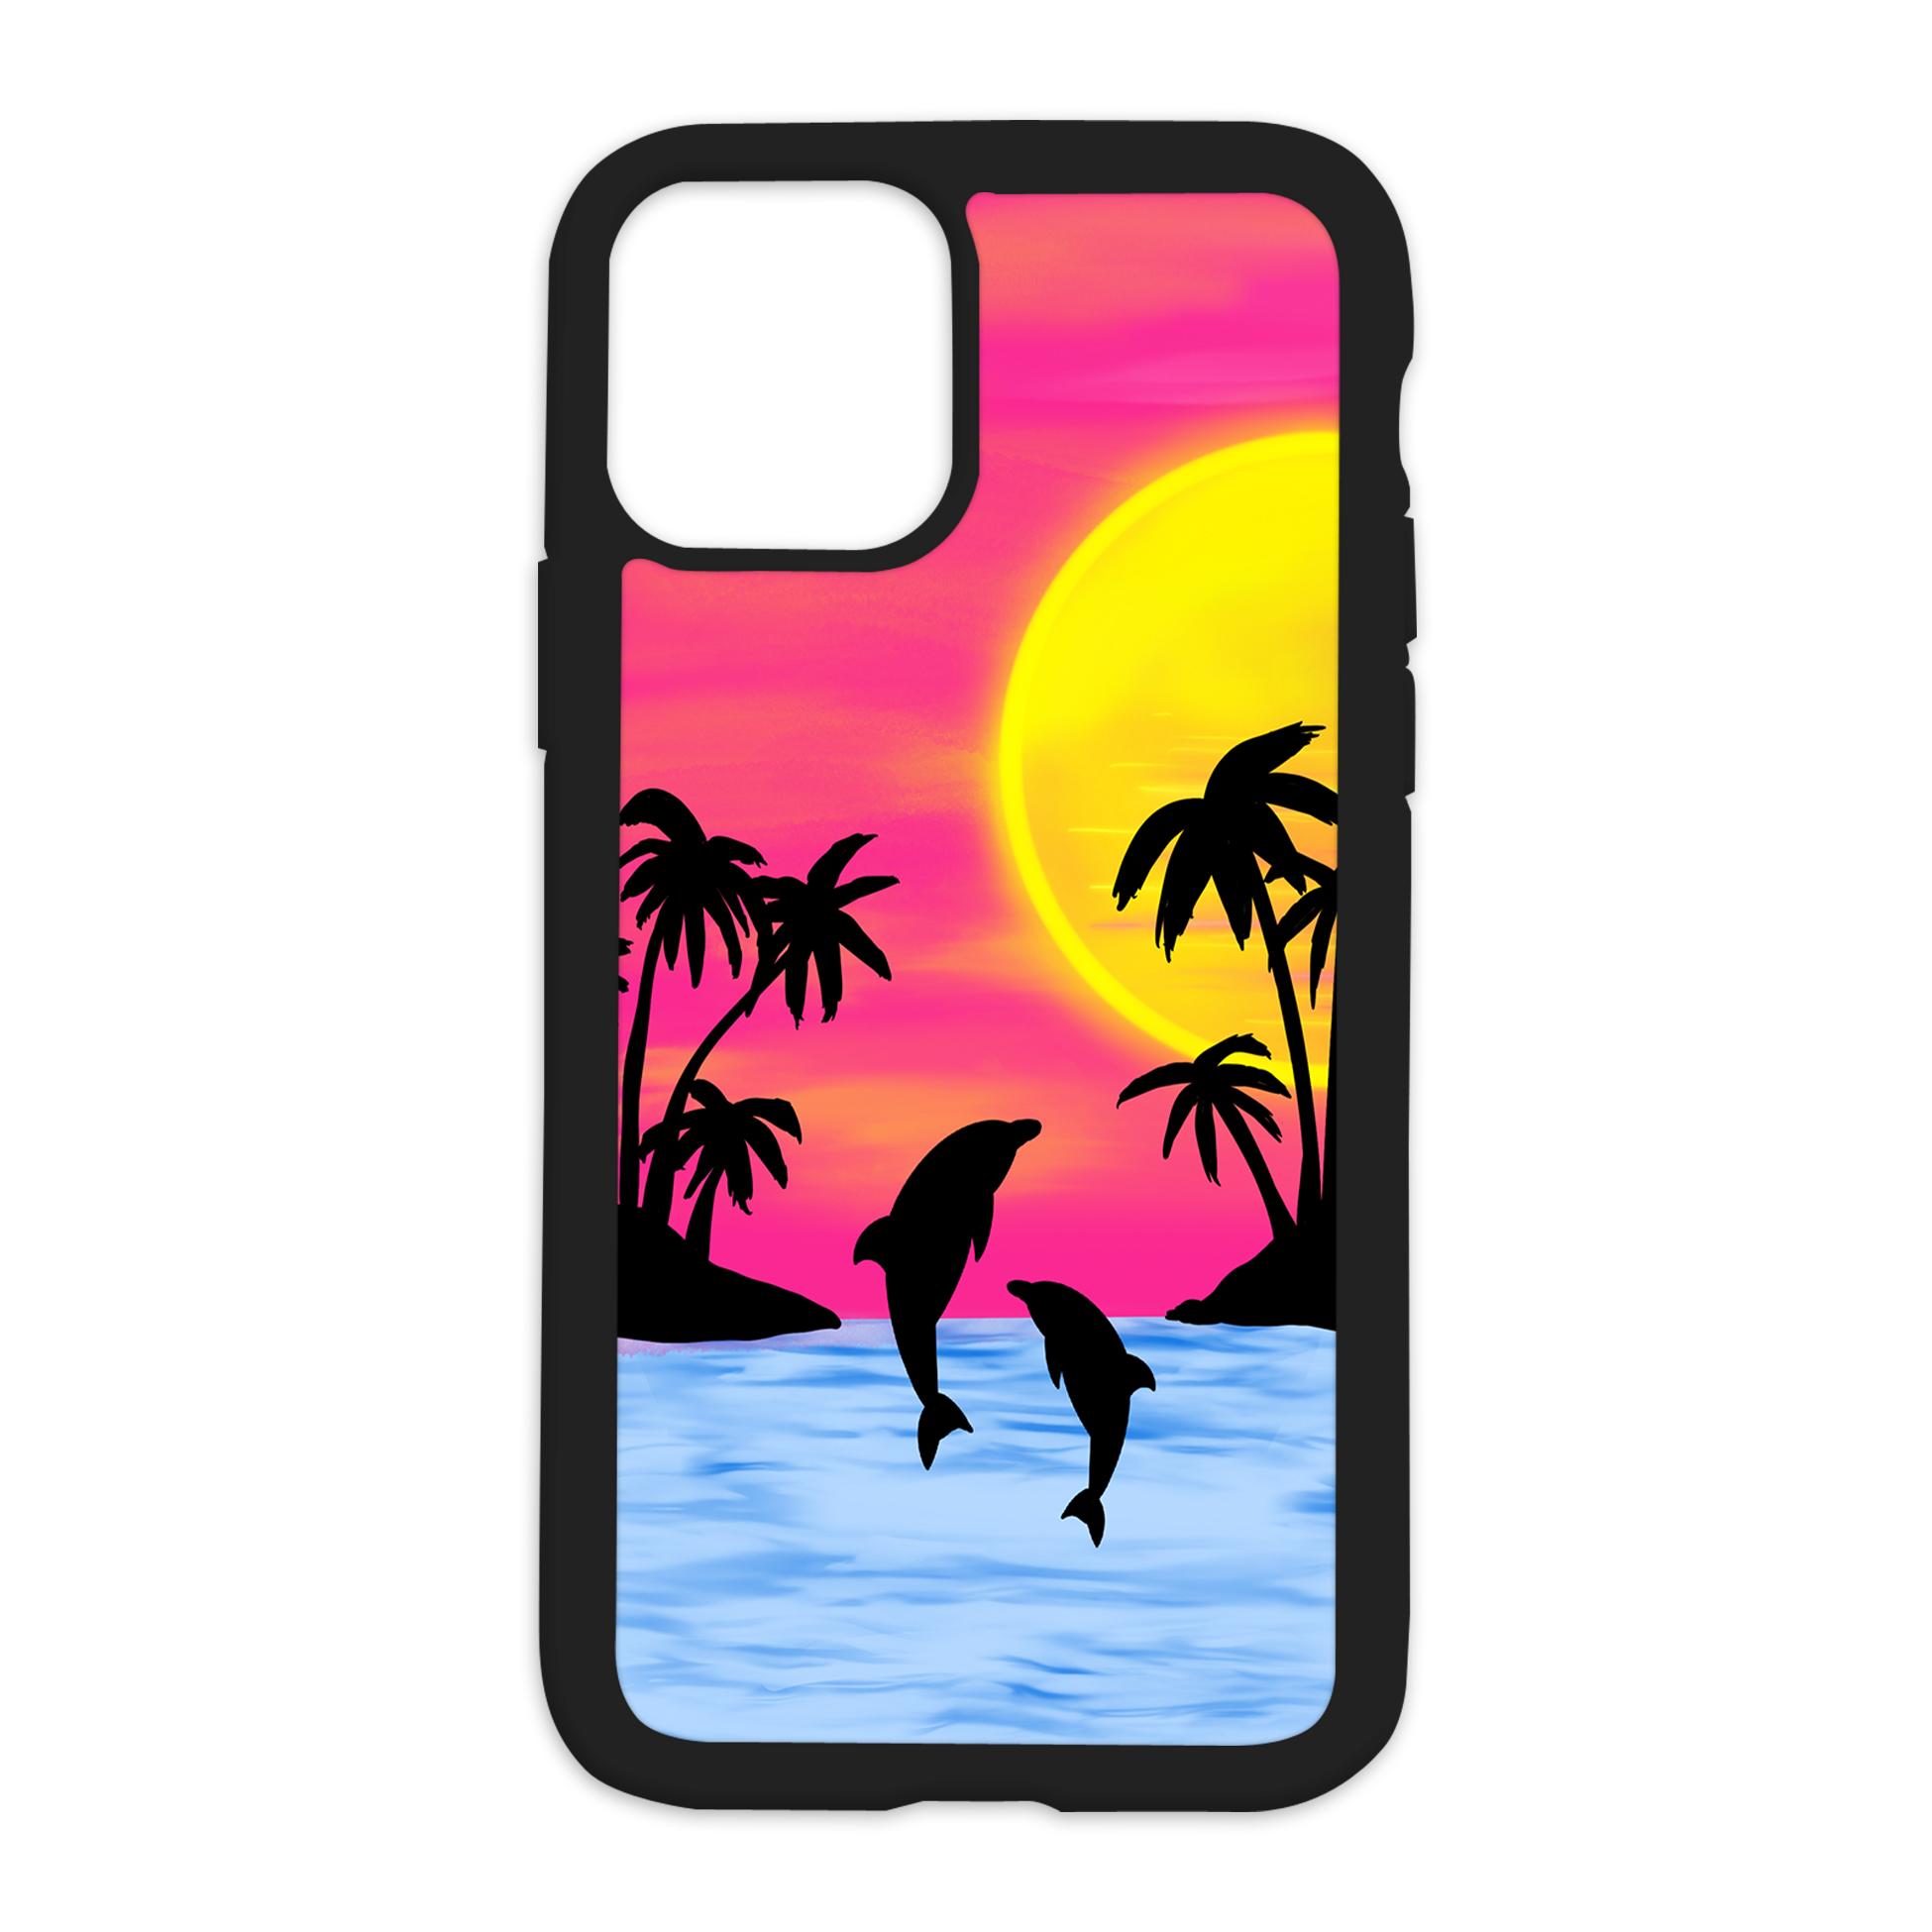 Sunset Vibes Design On Black Phone Case - 6/6s